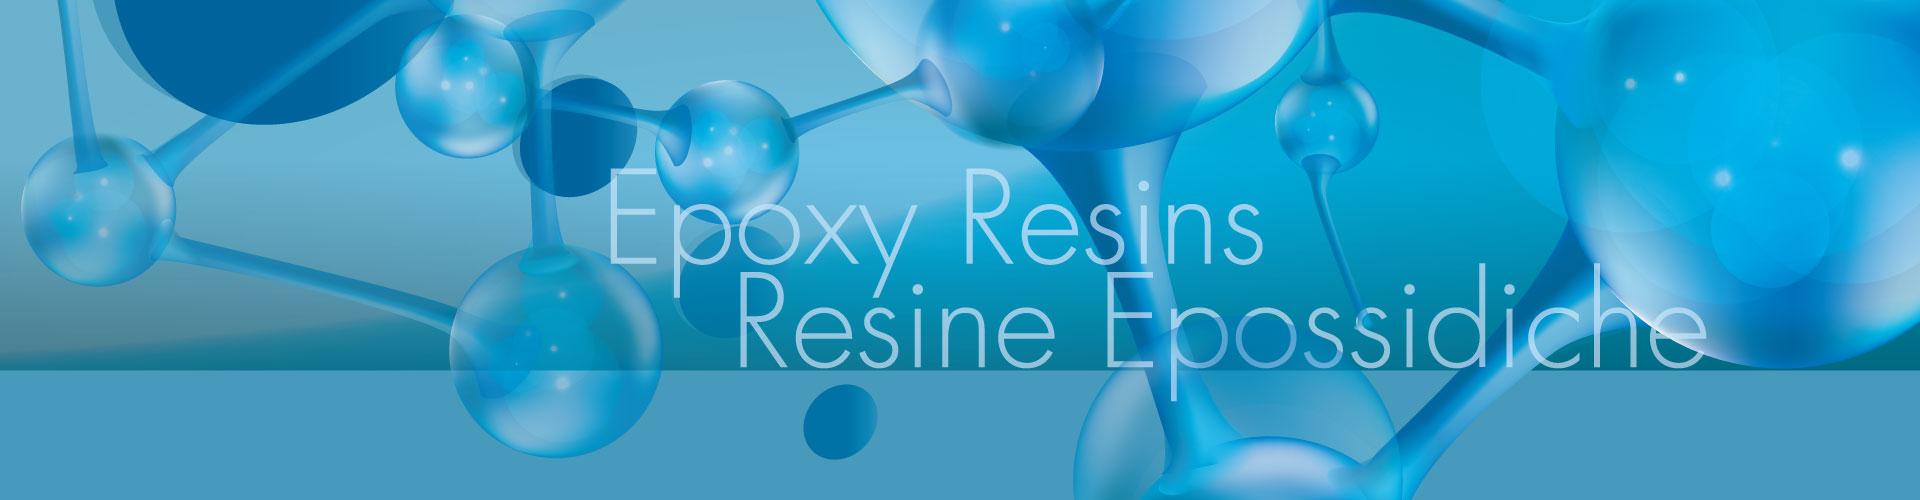 oxipol-molecole-03